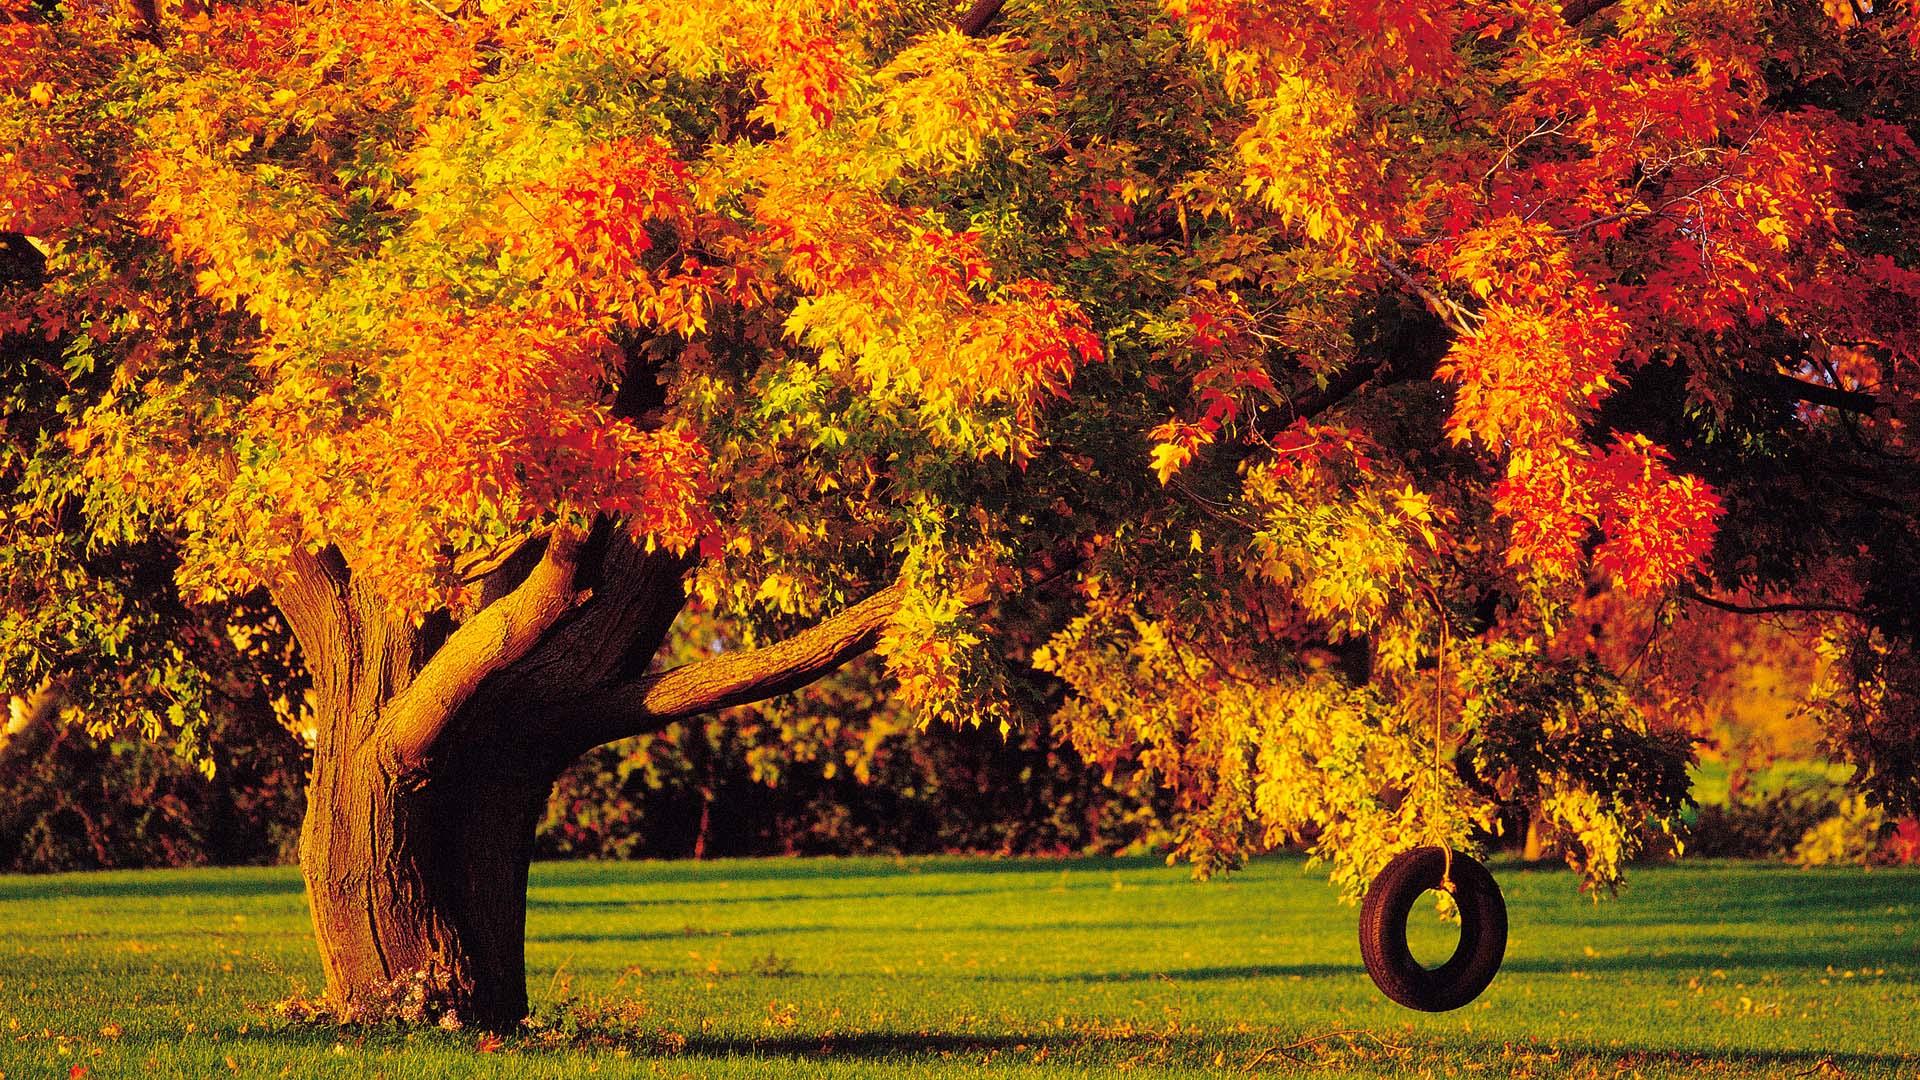 Autumn Trees wallpaper   690569 1920x1080